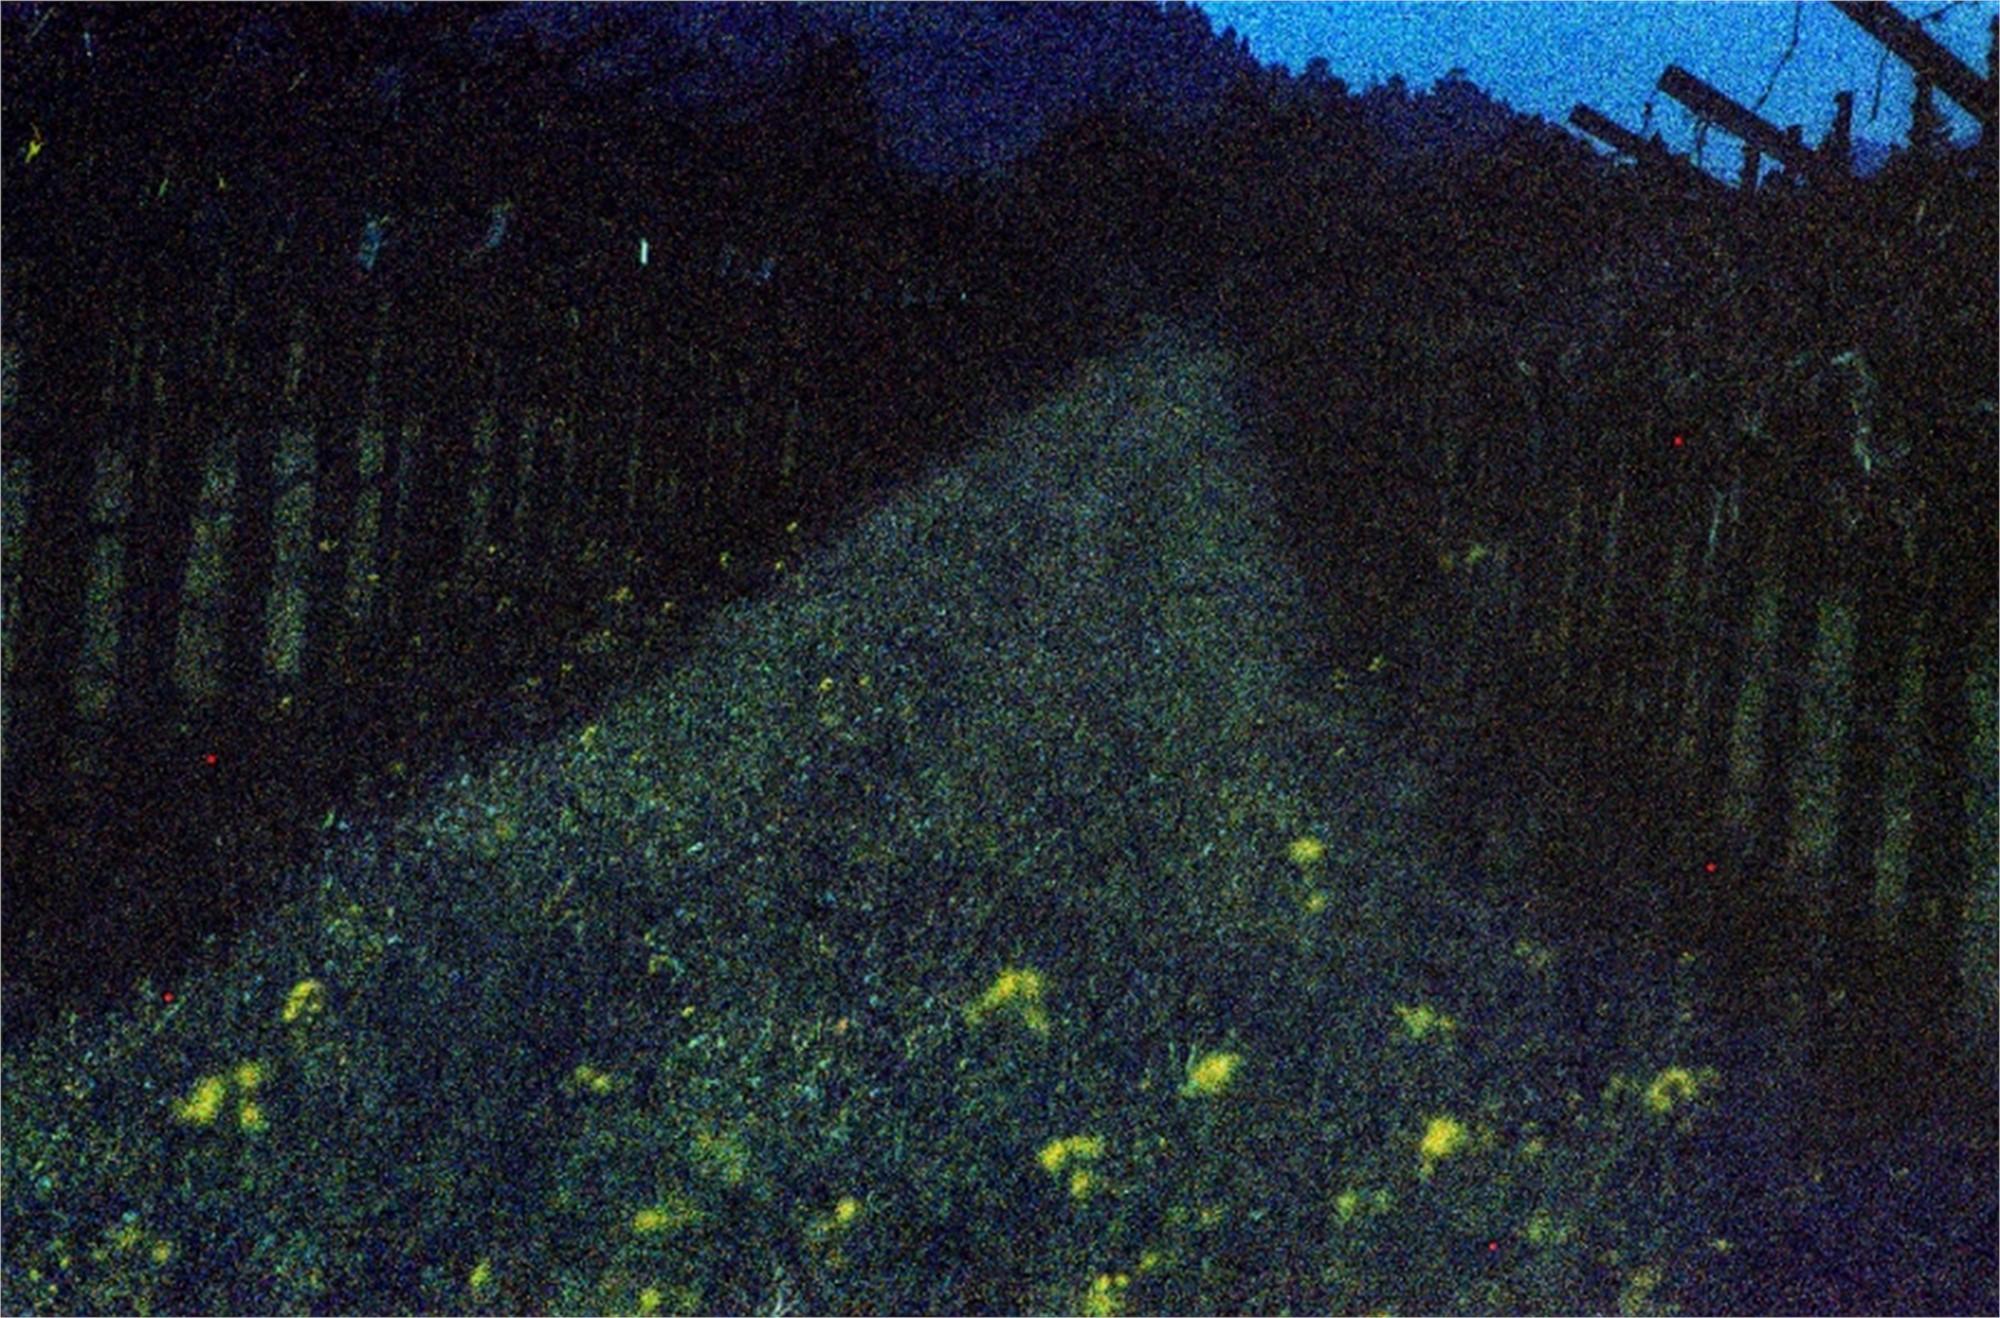 Abstract Vineyard by Sam Aslanian